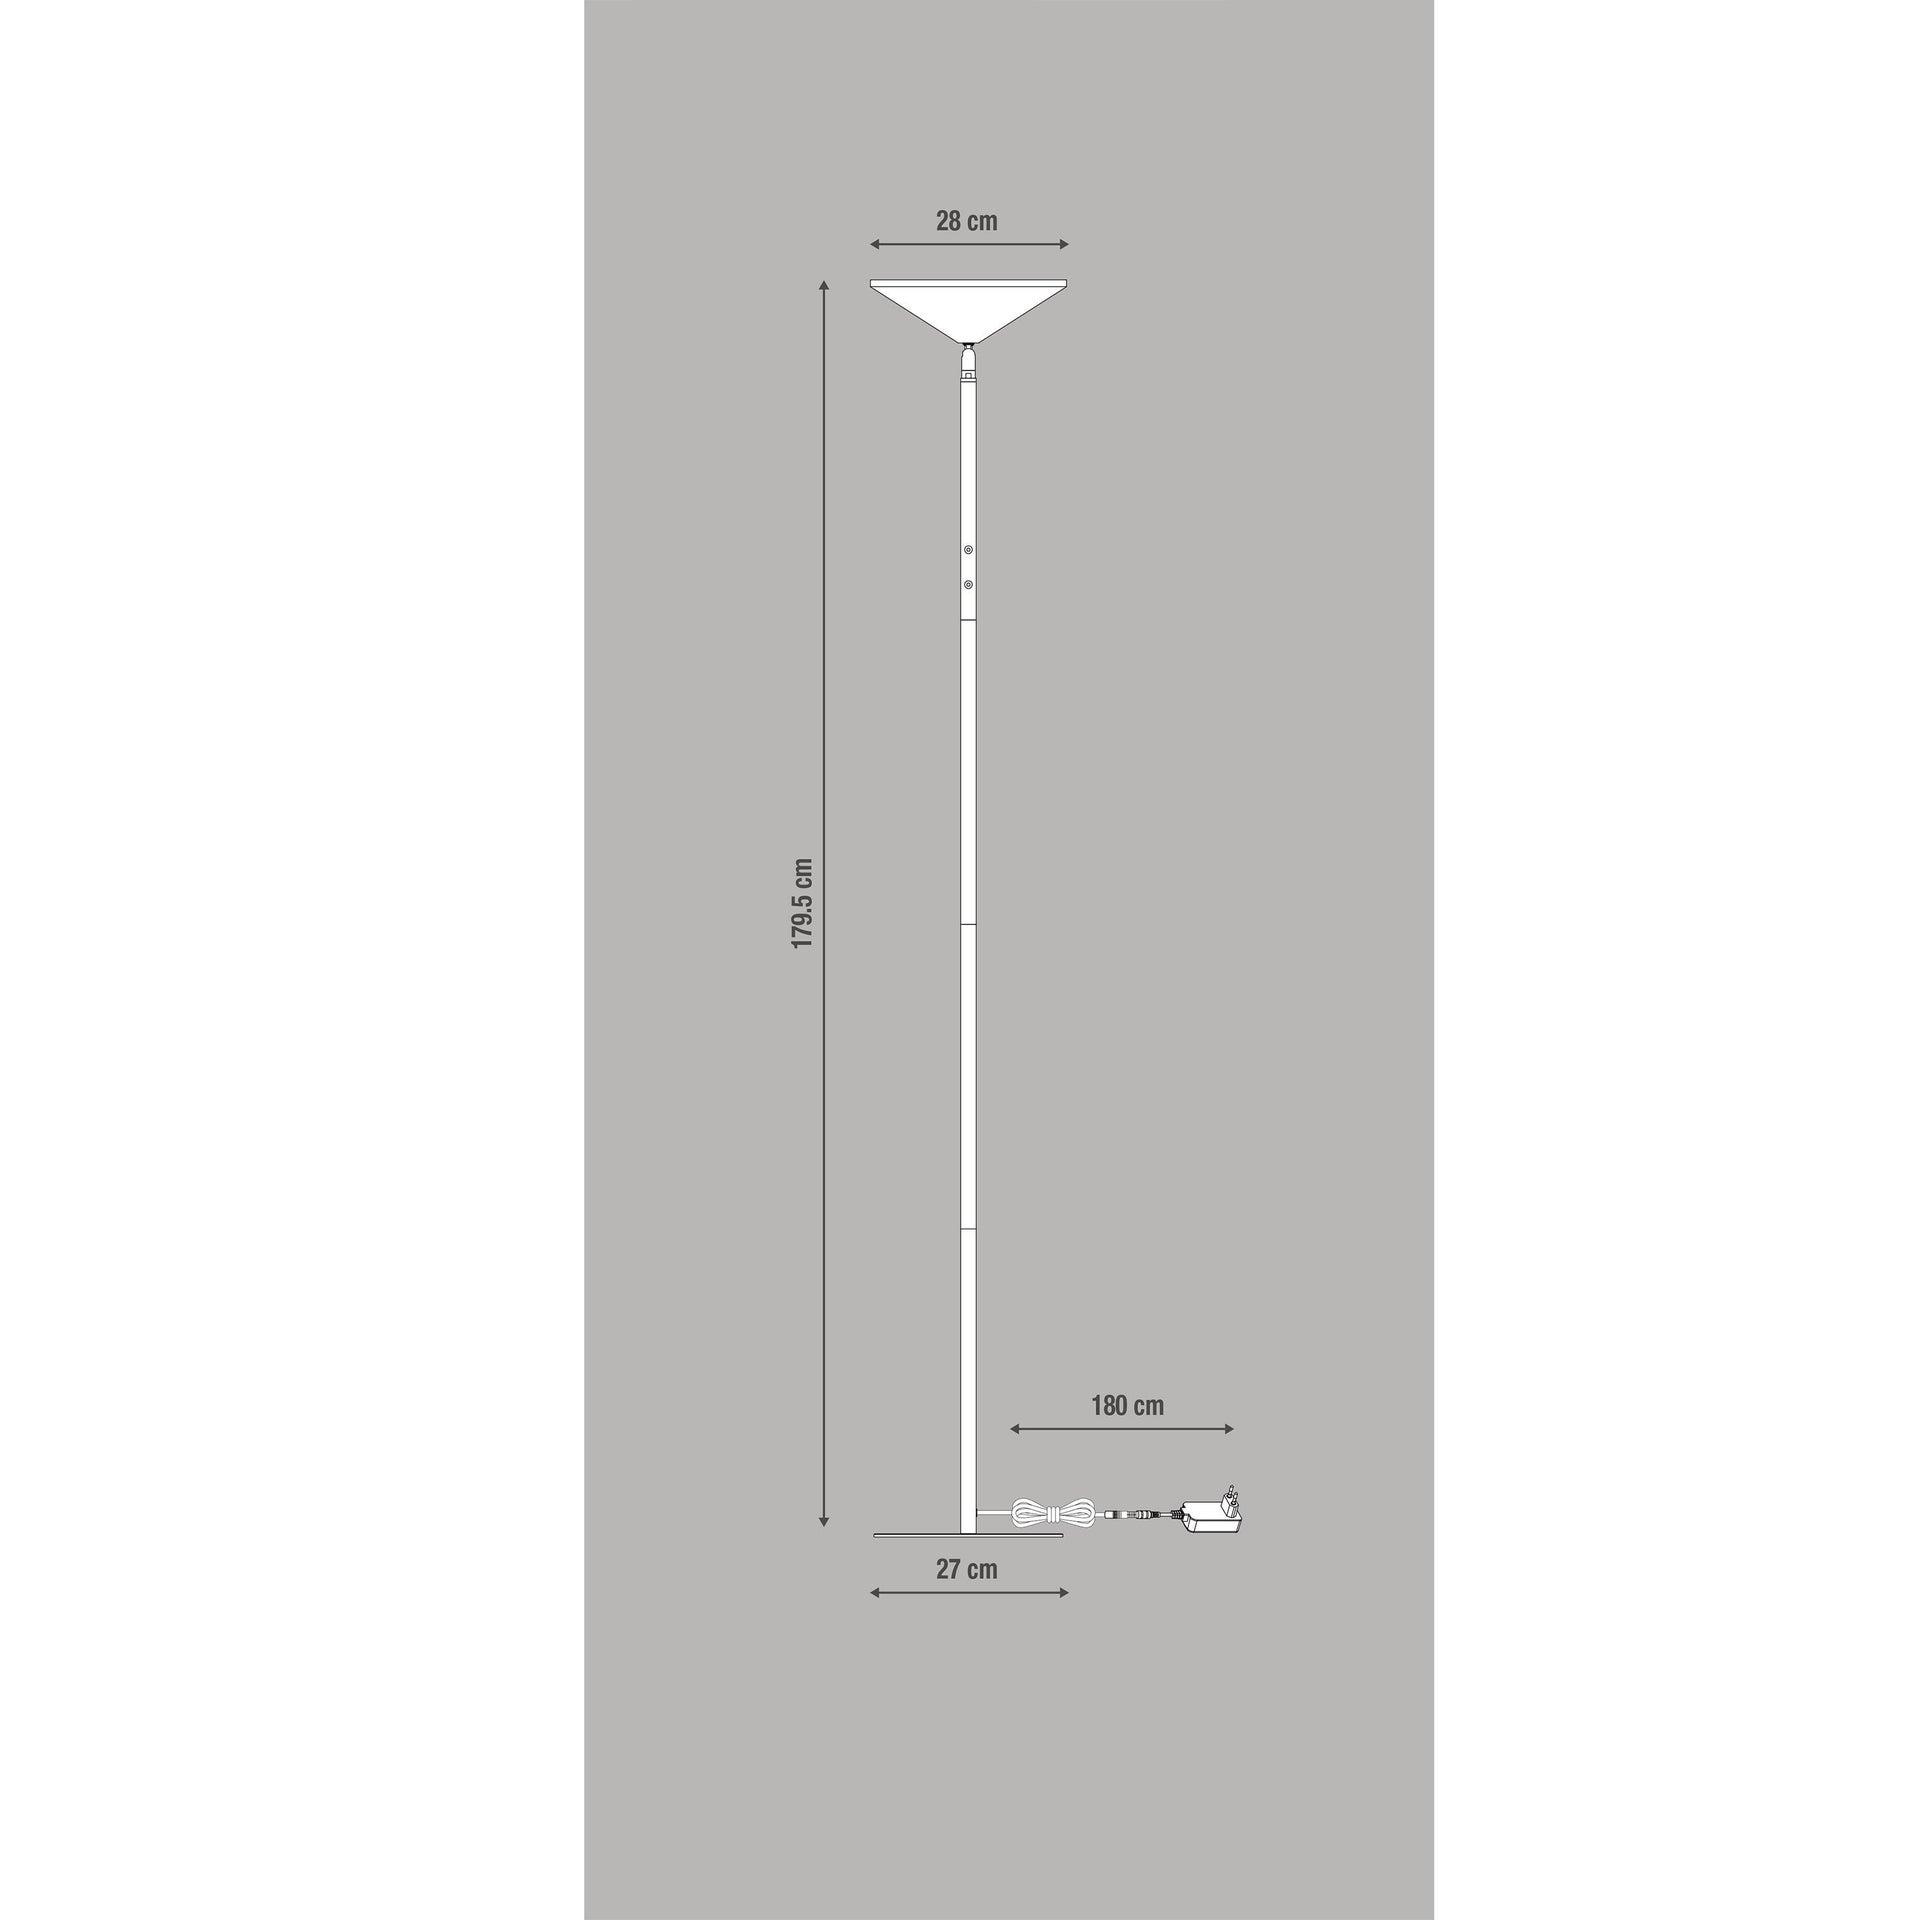 Lampada da terra Sauki grigio, in metallo, H180cm LED integrato INSPIRE - 8